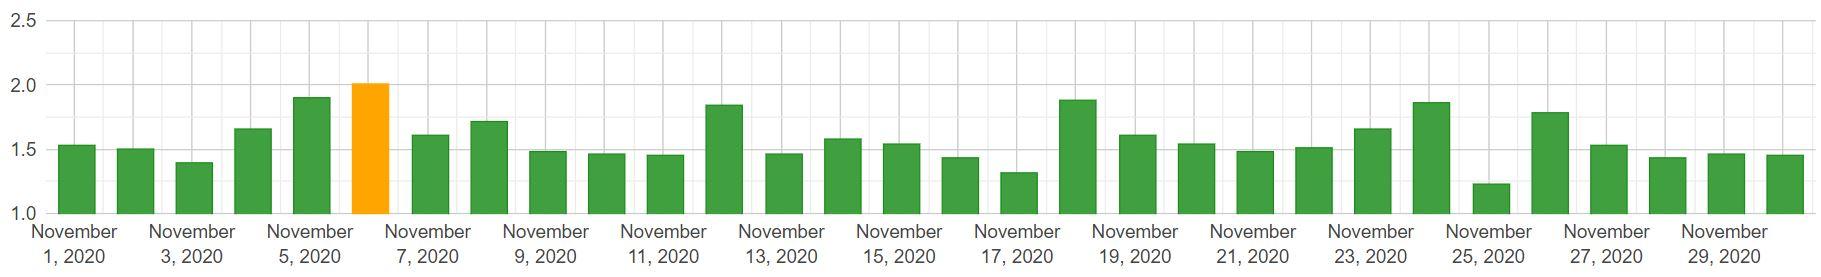 Algoroo: zmiany w SERP (desktop) - listopad 2020